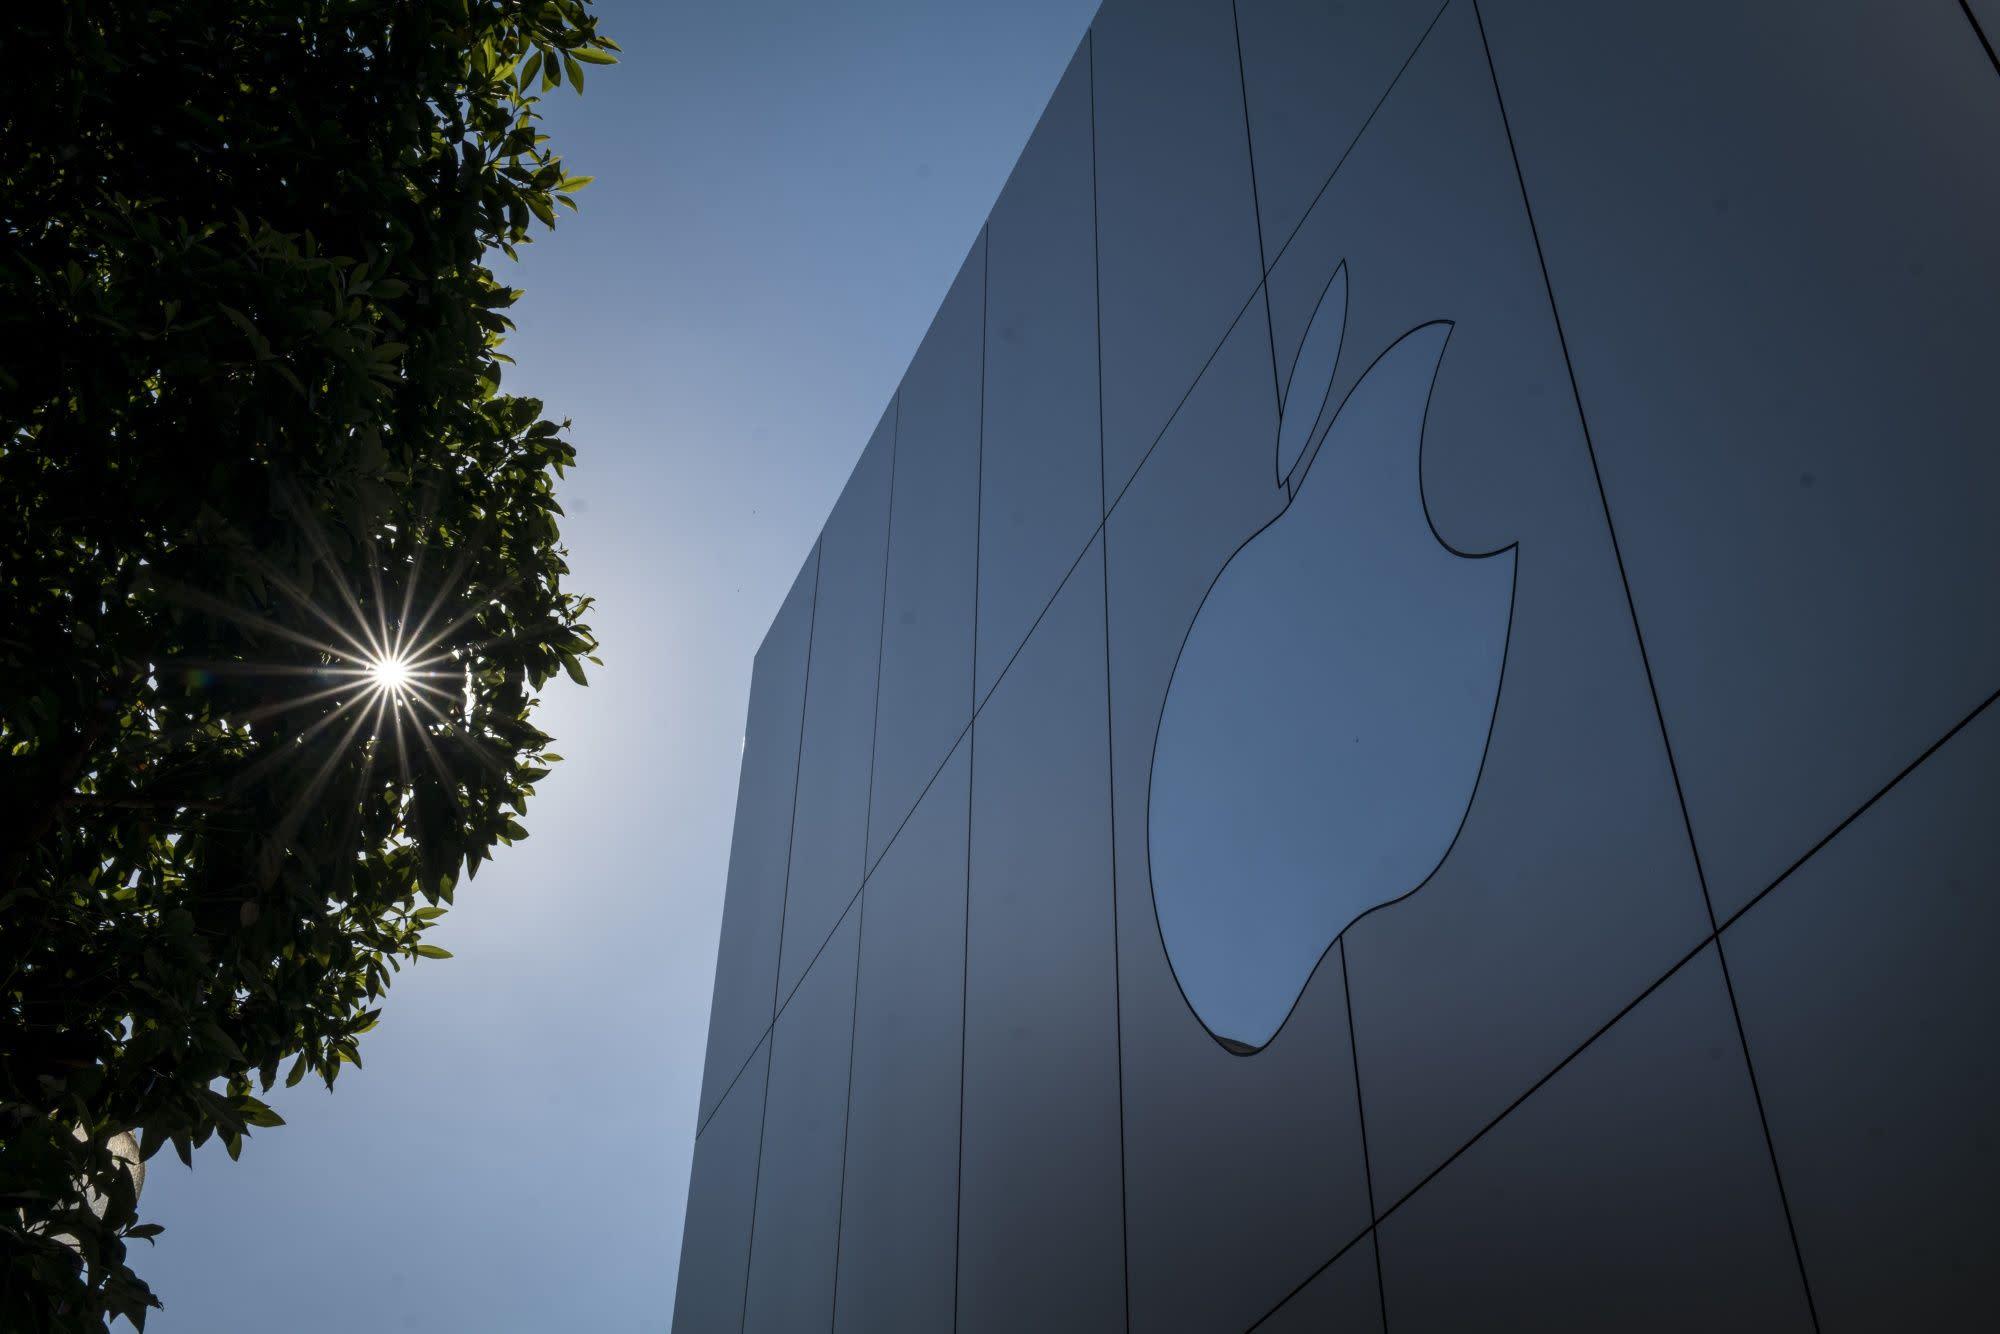 Renesas Confirms Talks to Buy Apple-Supplier Dialog Semi - Yahoo Finance